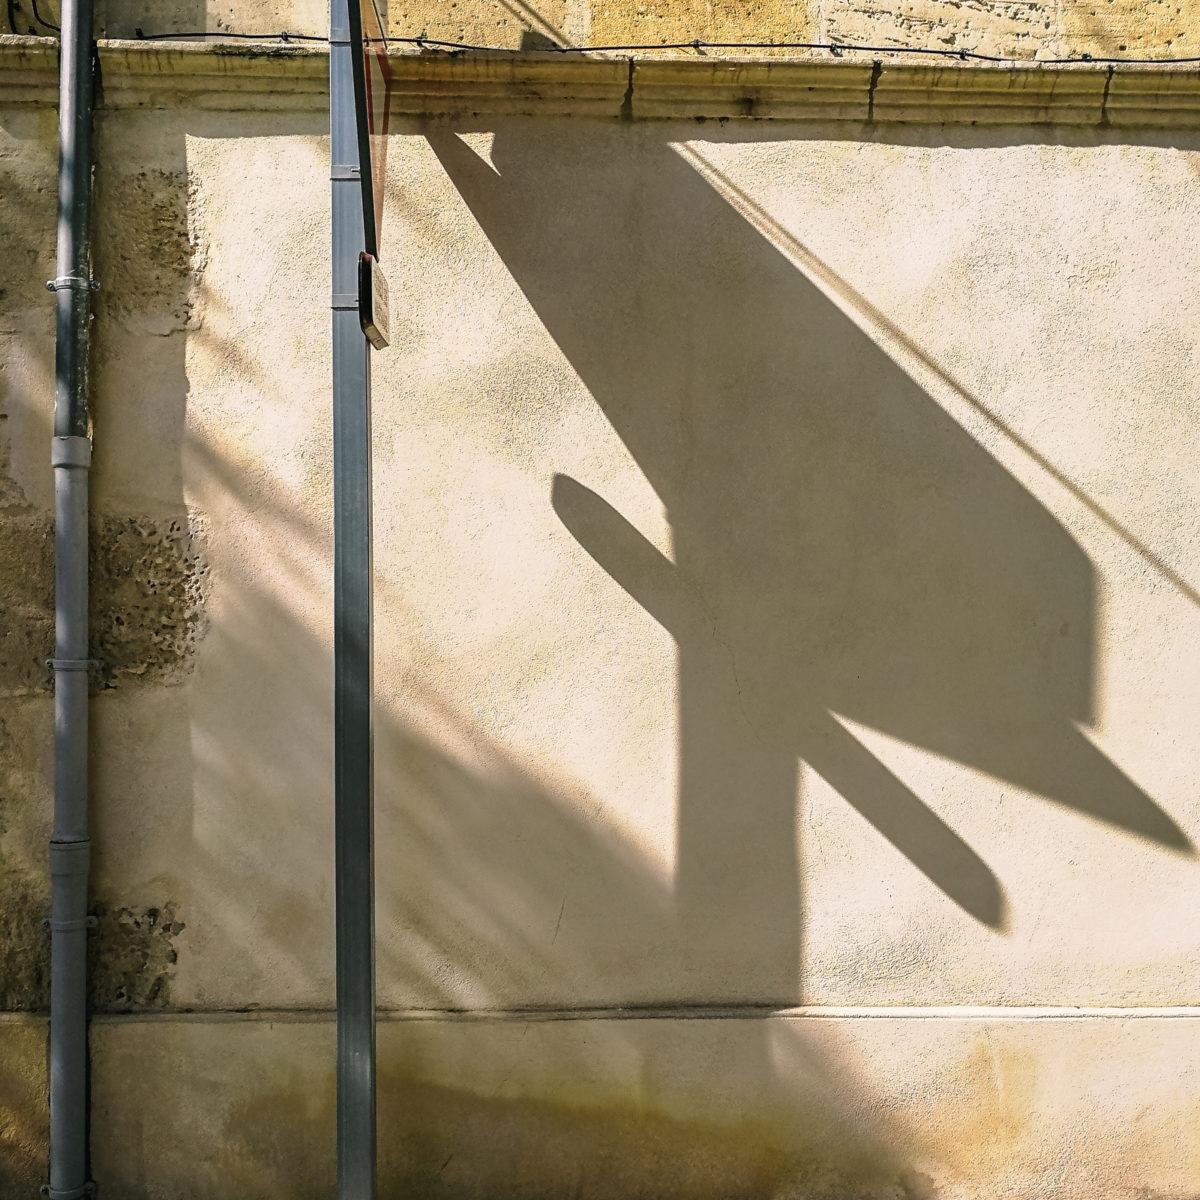 aliocha boi arles photographie projections ombre lumiere5 - Le photographe Aliocha Boi révèle la façade street d'Arles